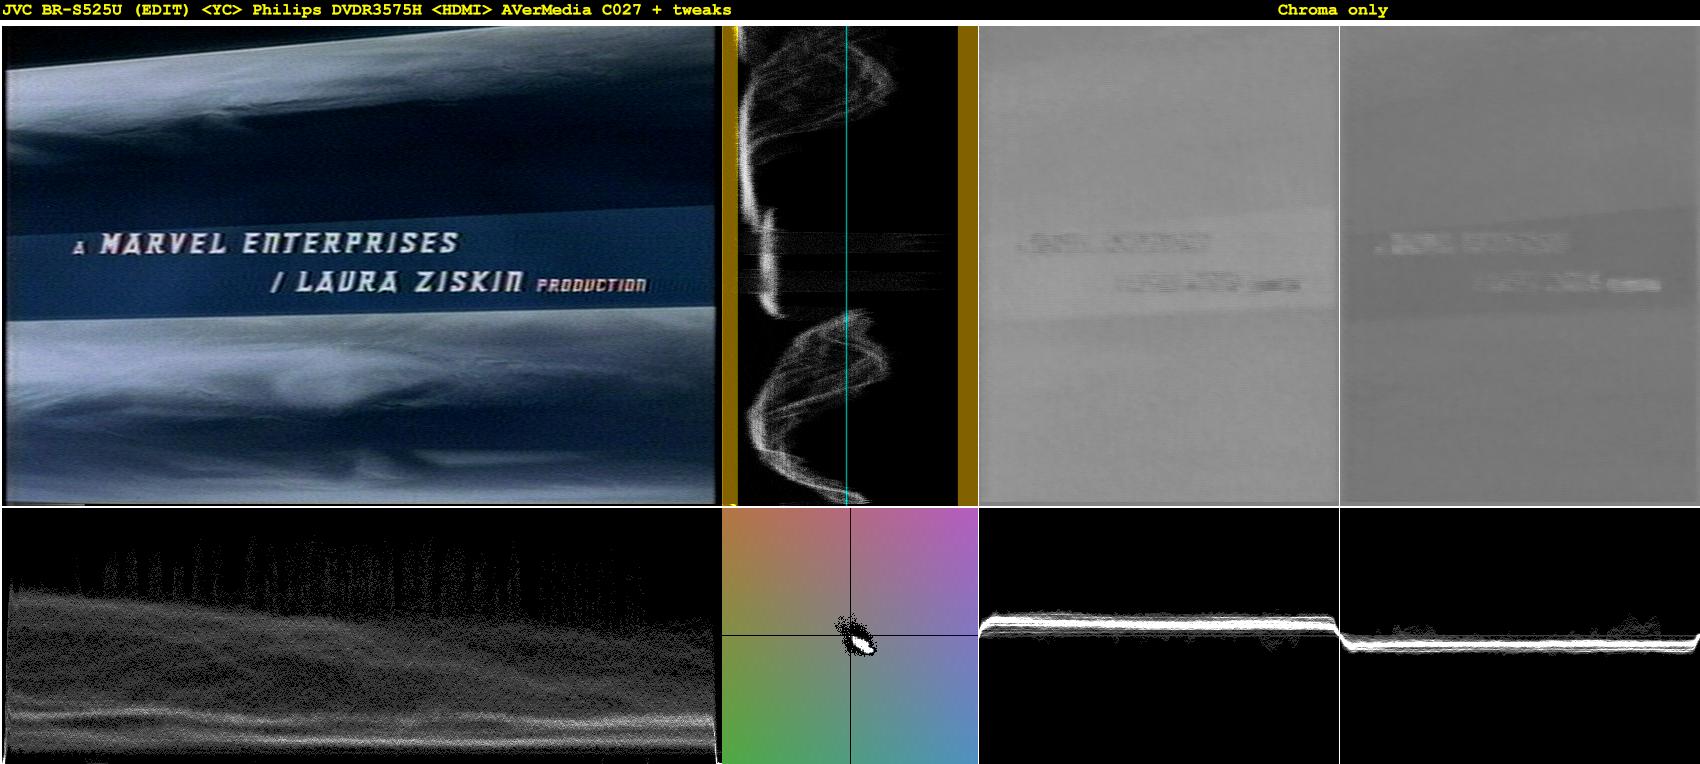 Click image for larger version  Name:0-09-01 - JVC BR-S525U (EDIT).png Views:1474 Size:931.4 KB ID:37665